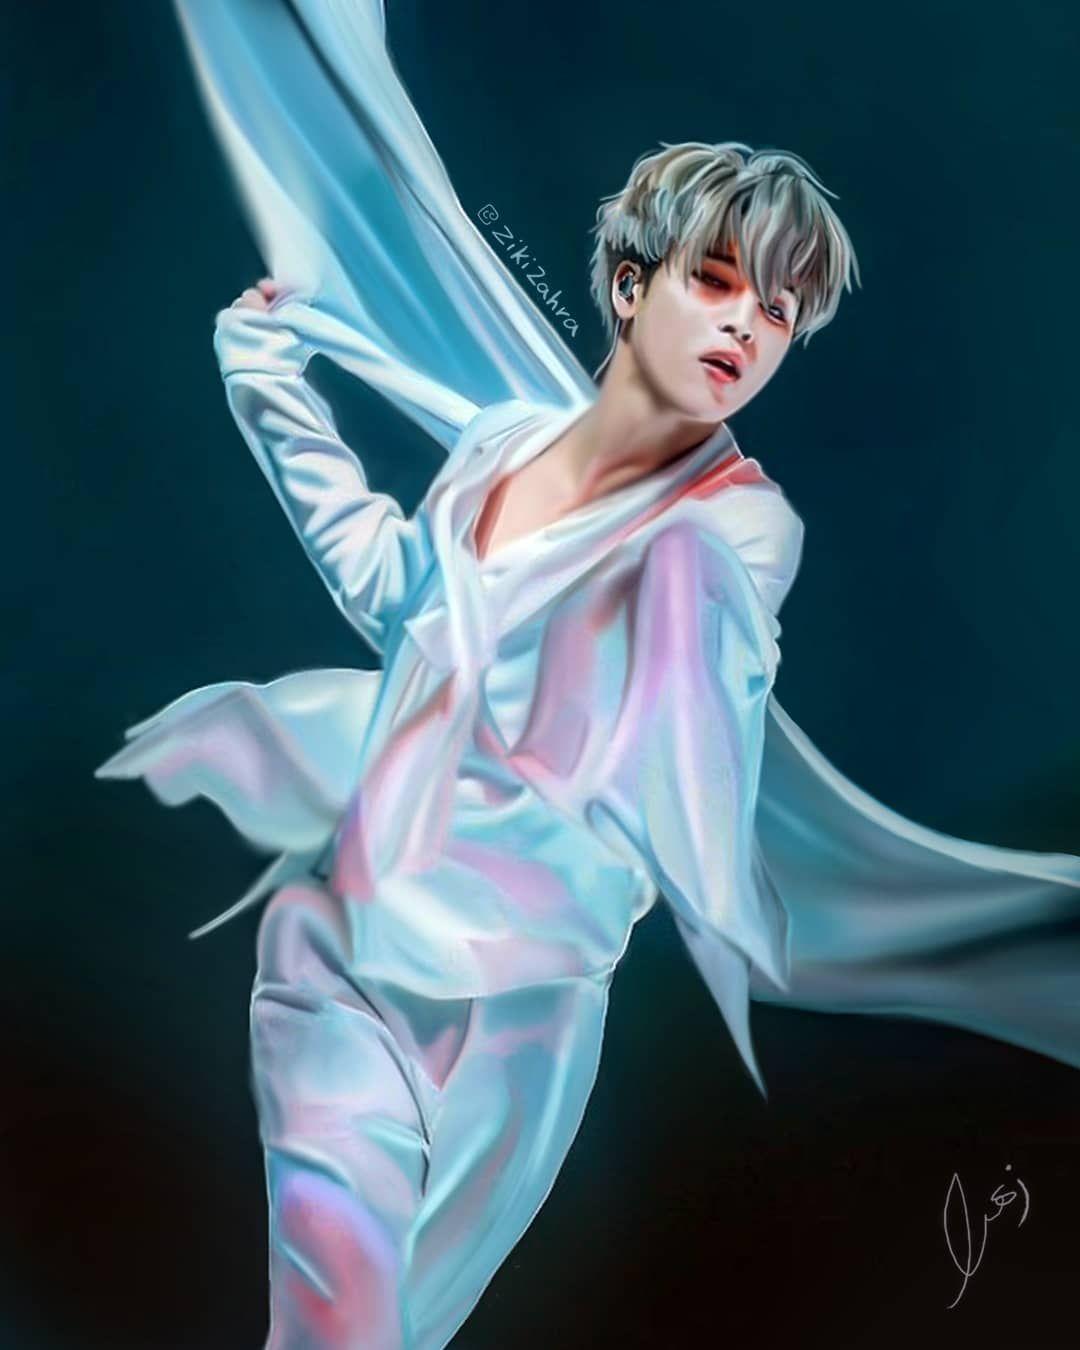 Jimin Melon Music Awards 2019 Zikizahra Jimin Fanart Park Jimin Bts Bts Jimin